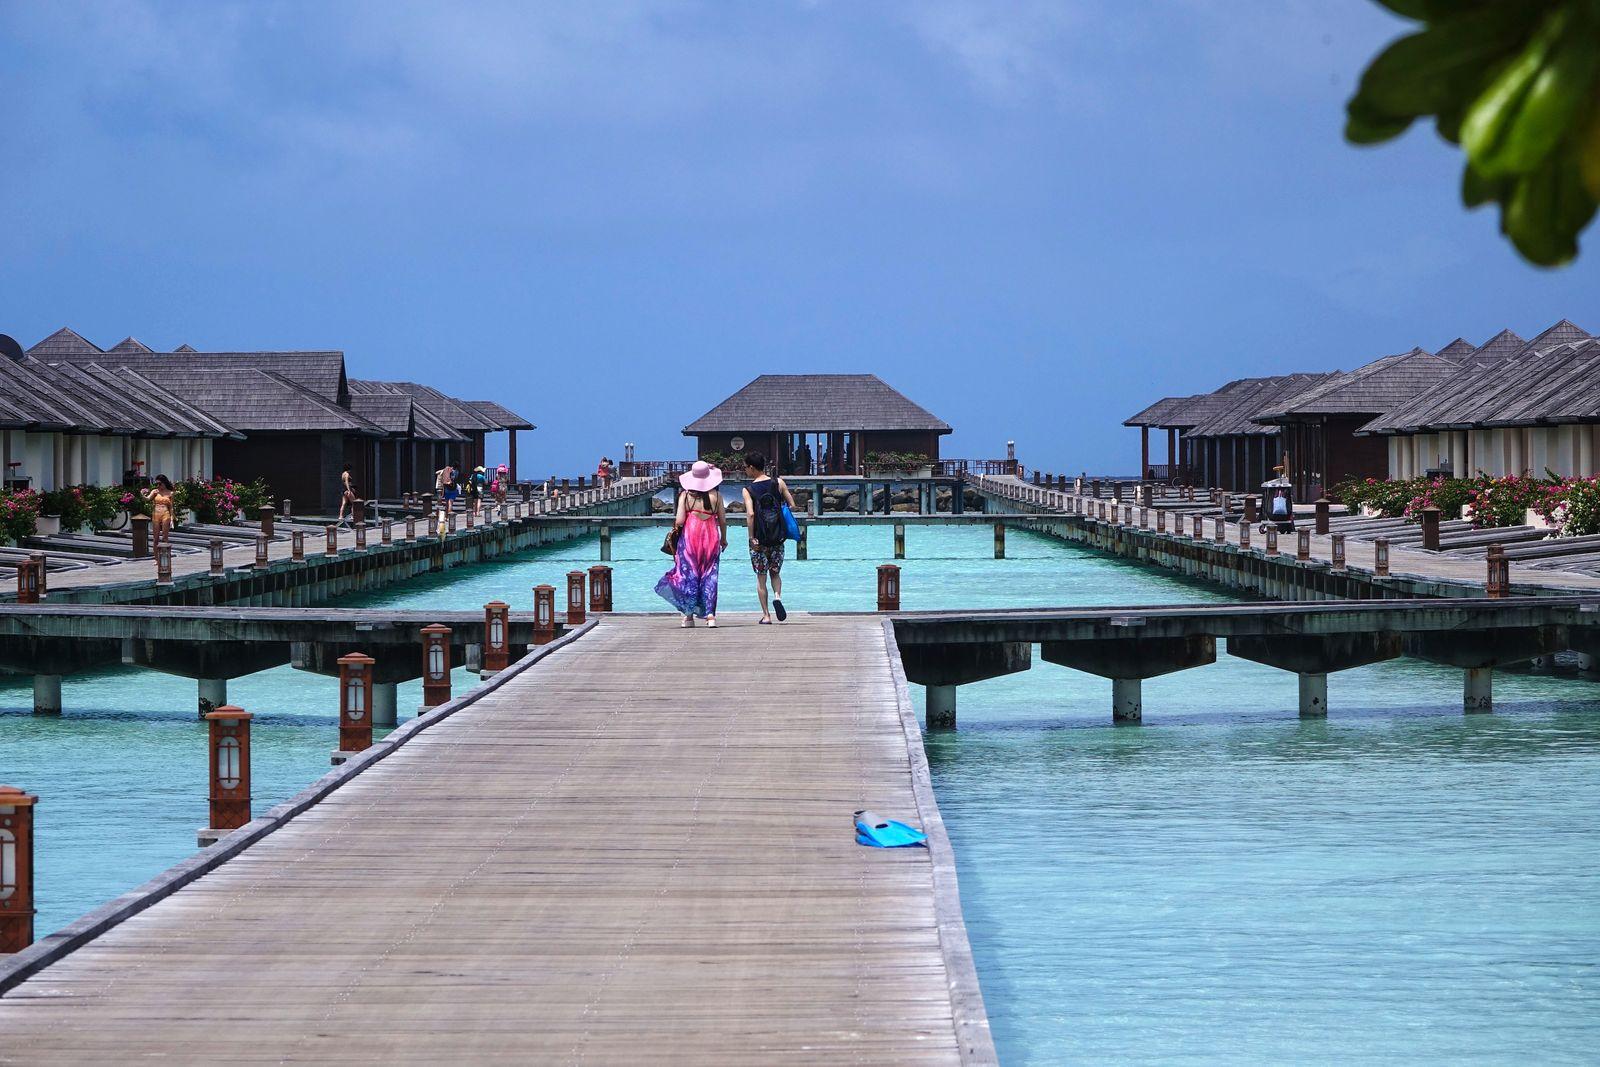 Maldives, little island resorts